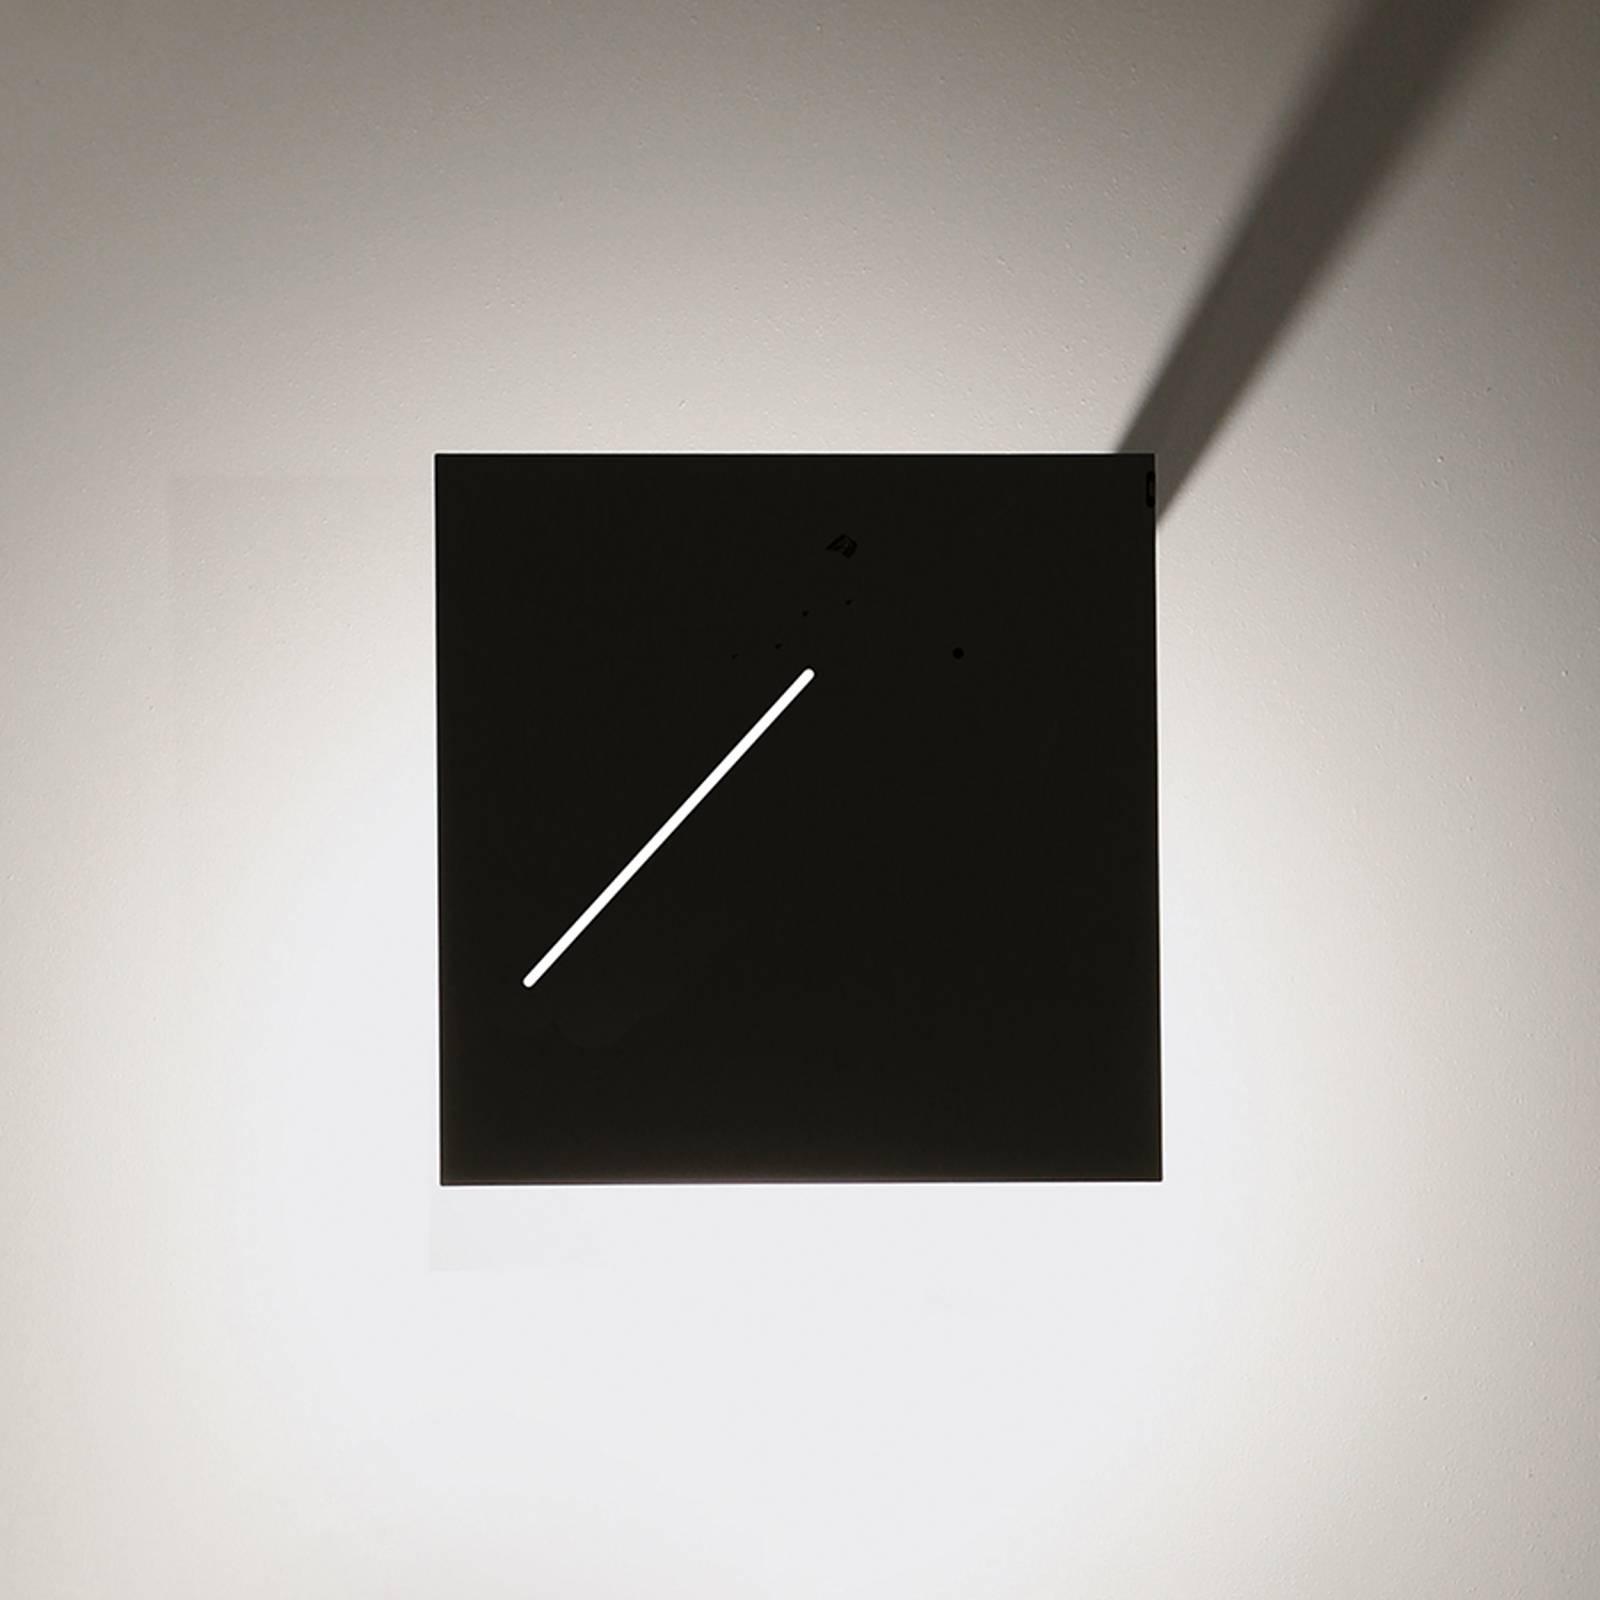 Designerska lampa stojąca LED Des.agn, czarna